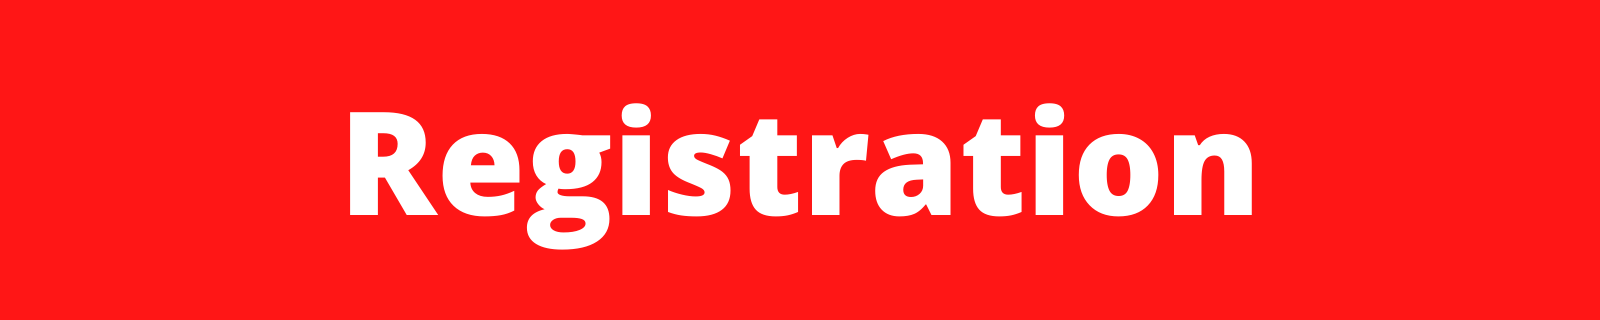 "banner that reads ""registration"""